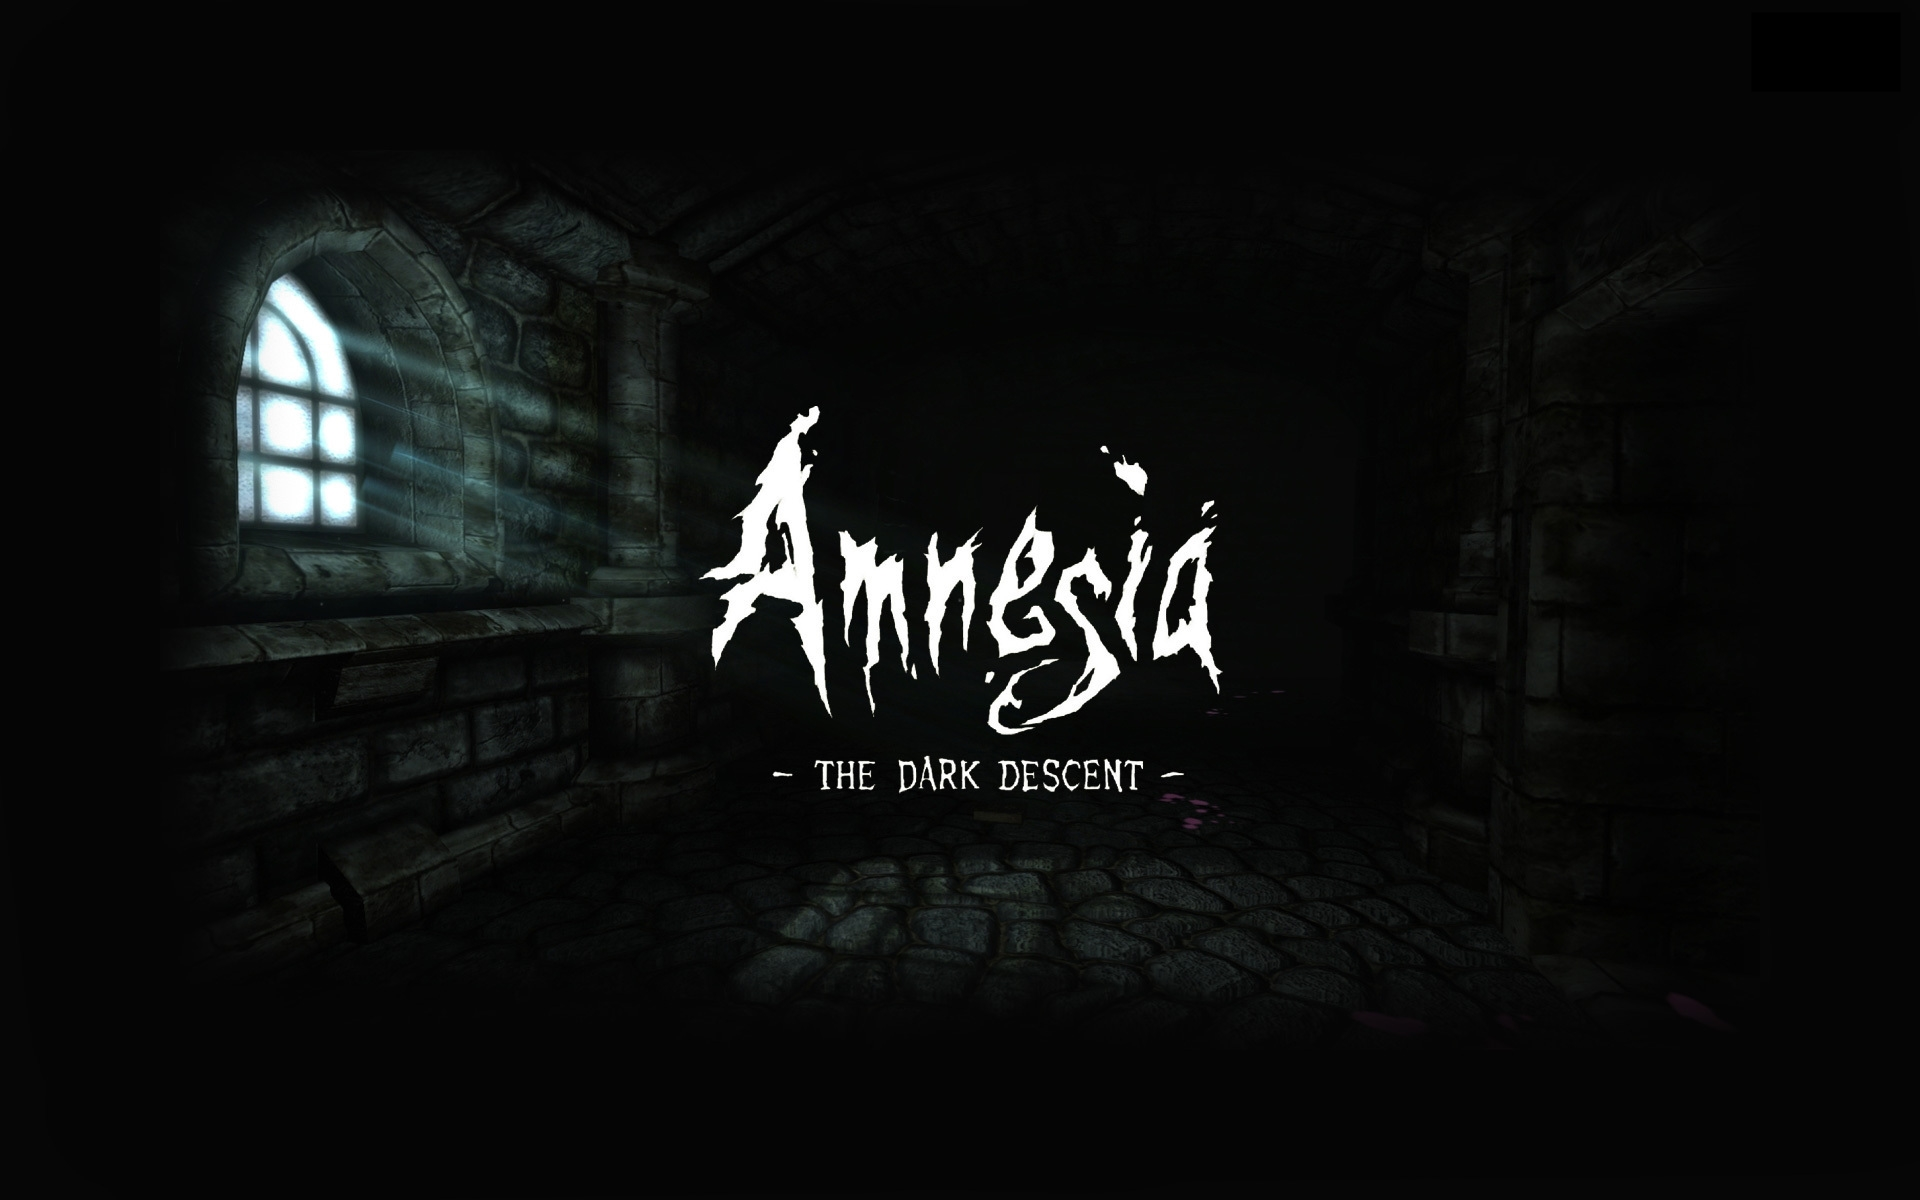 amnesia-the-dark-descent-8848-1920x1200(1).jpg